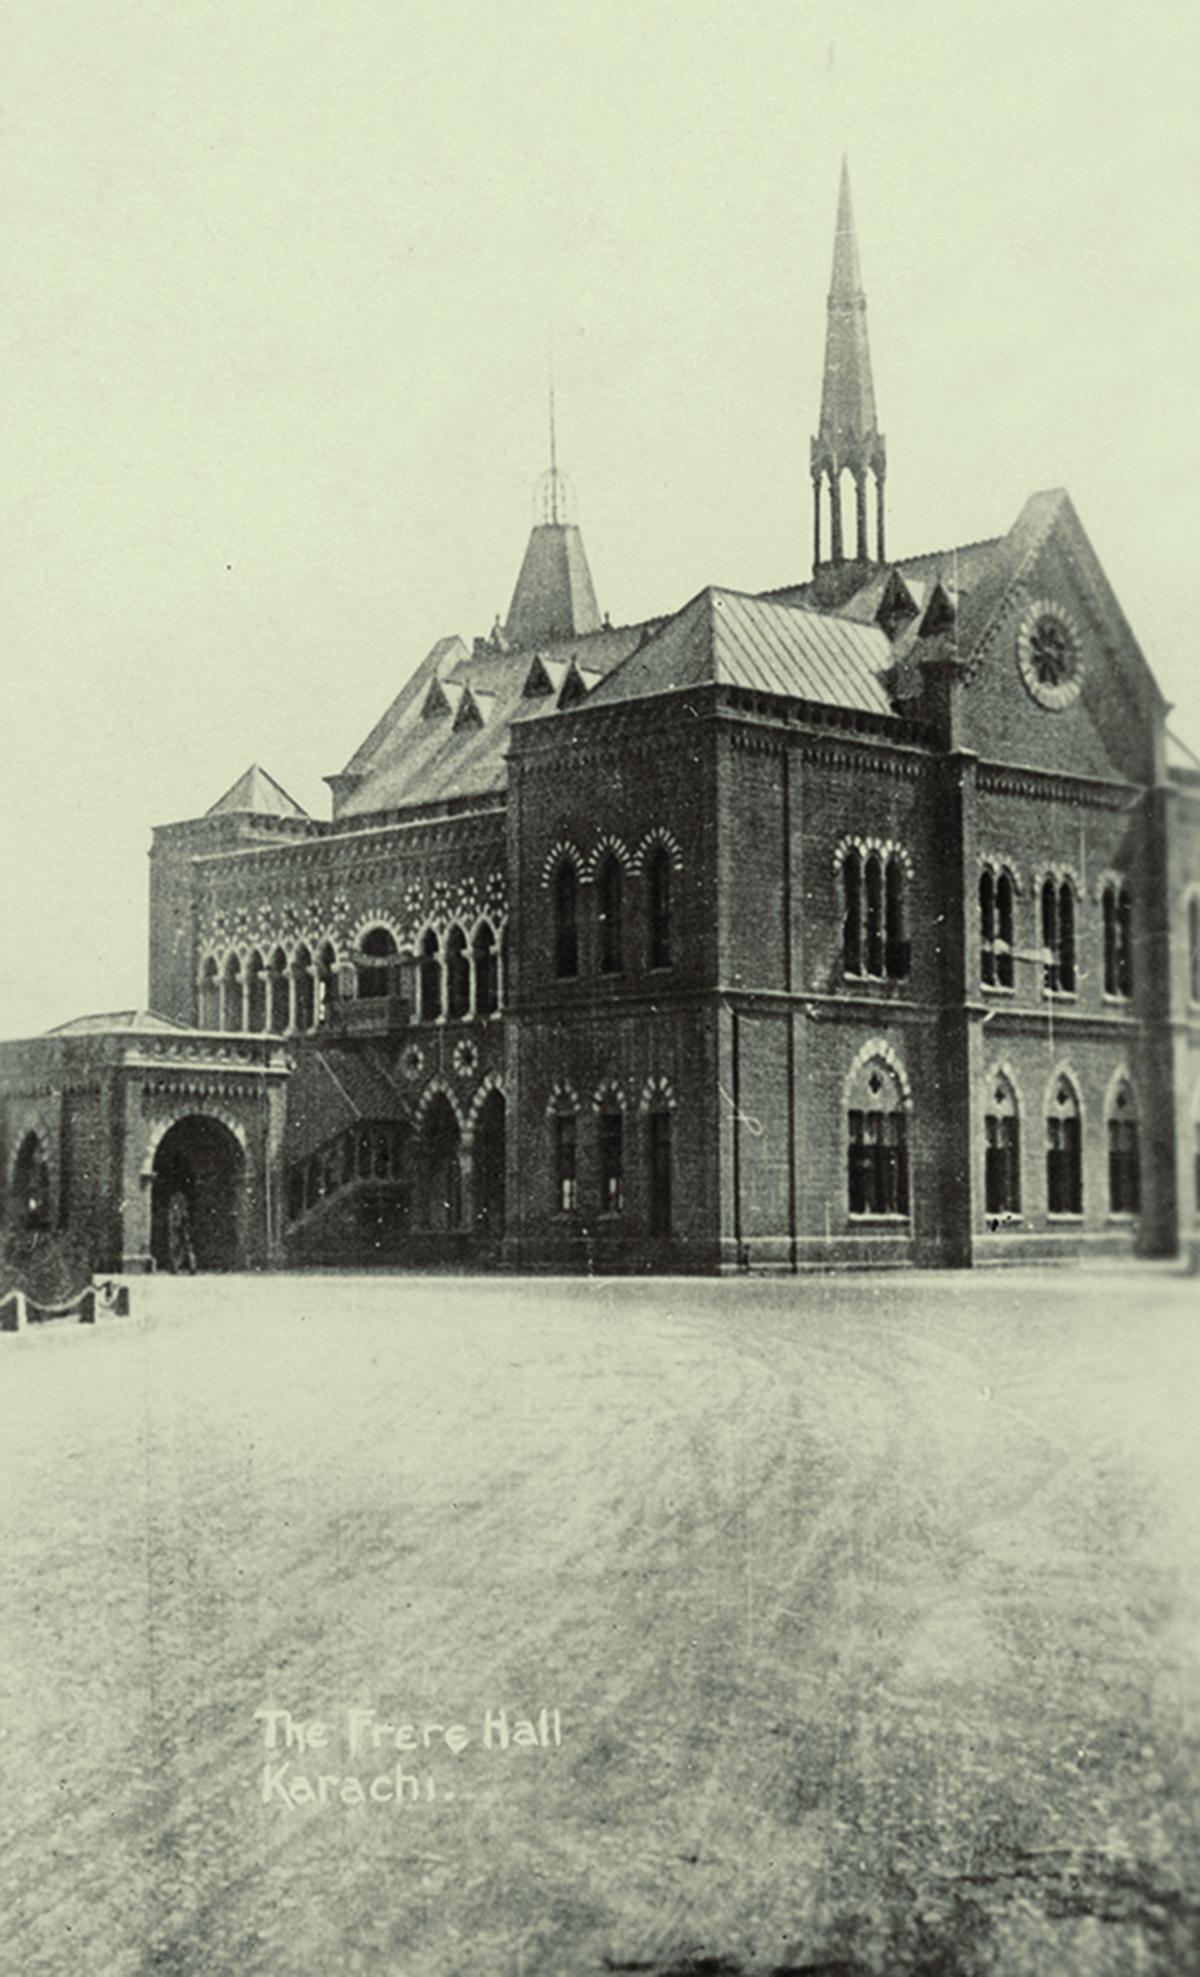 Frere Hall